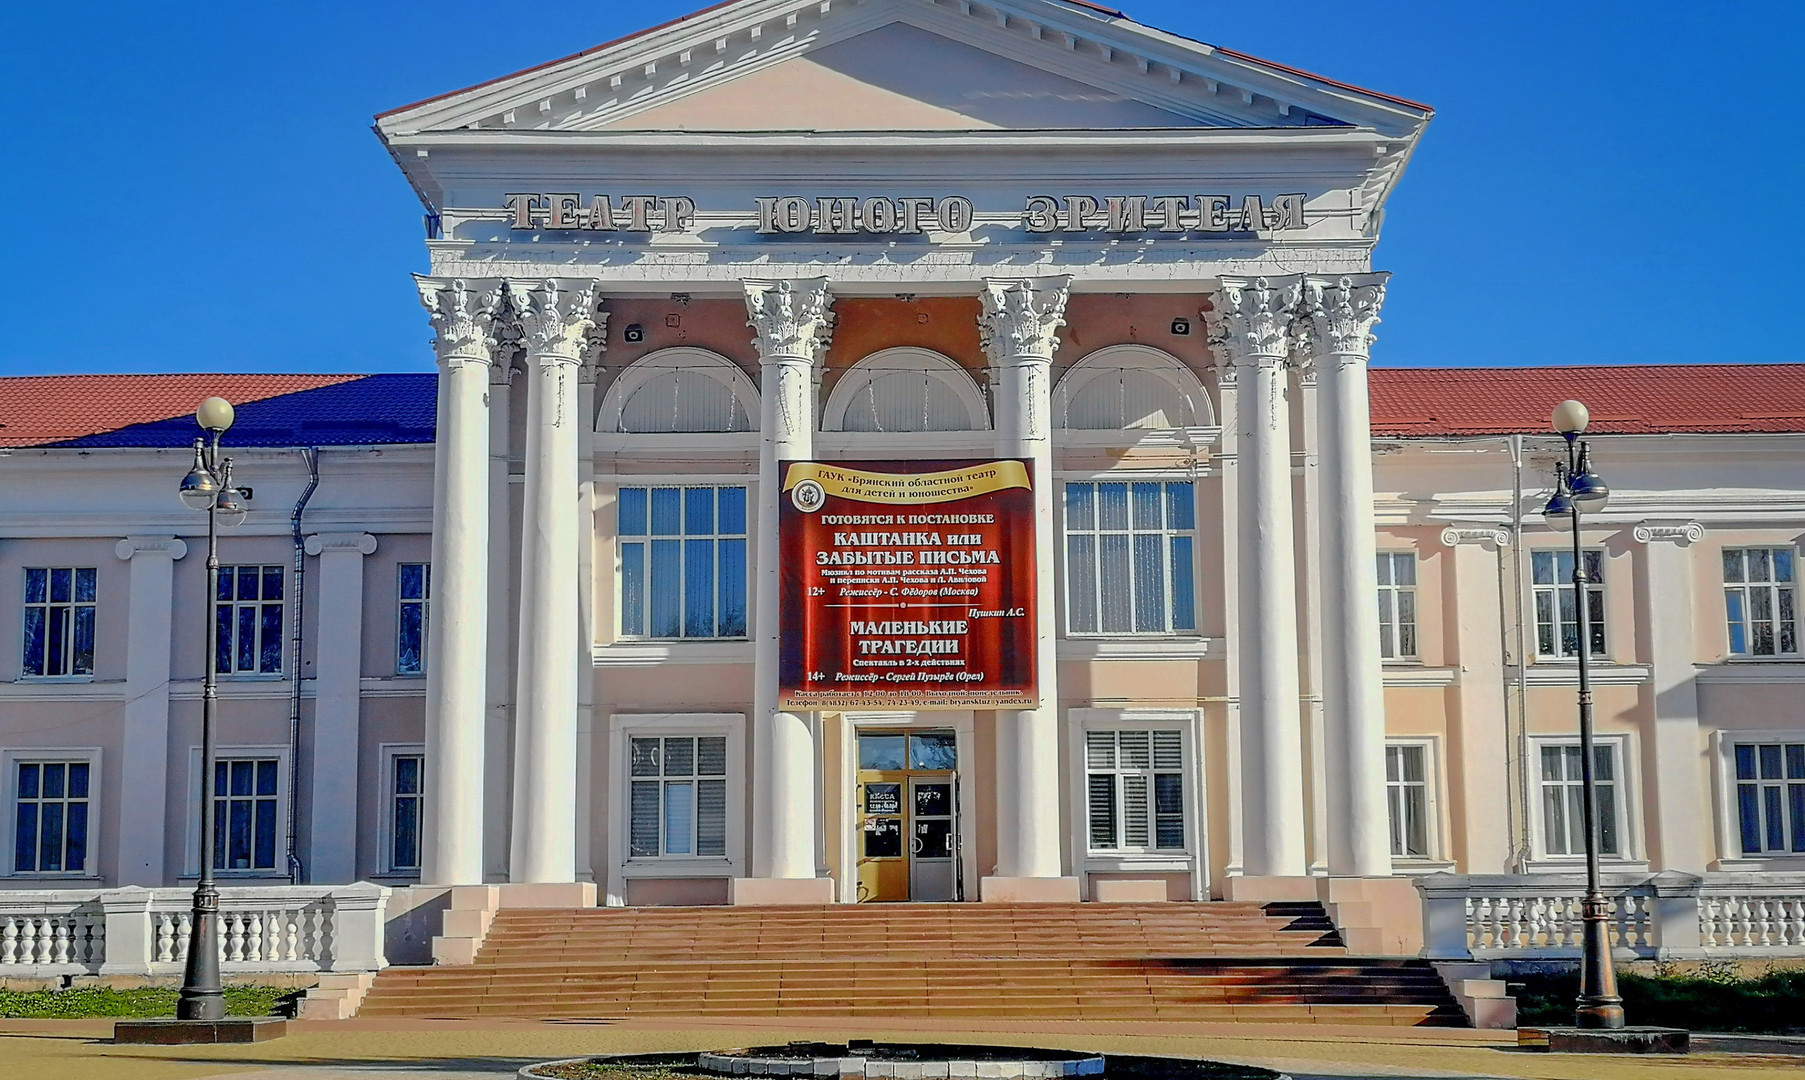 Театр юного зрителя, Брянск